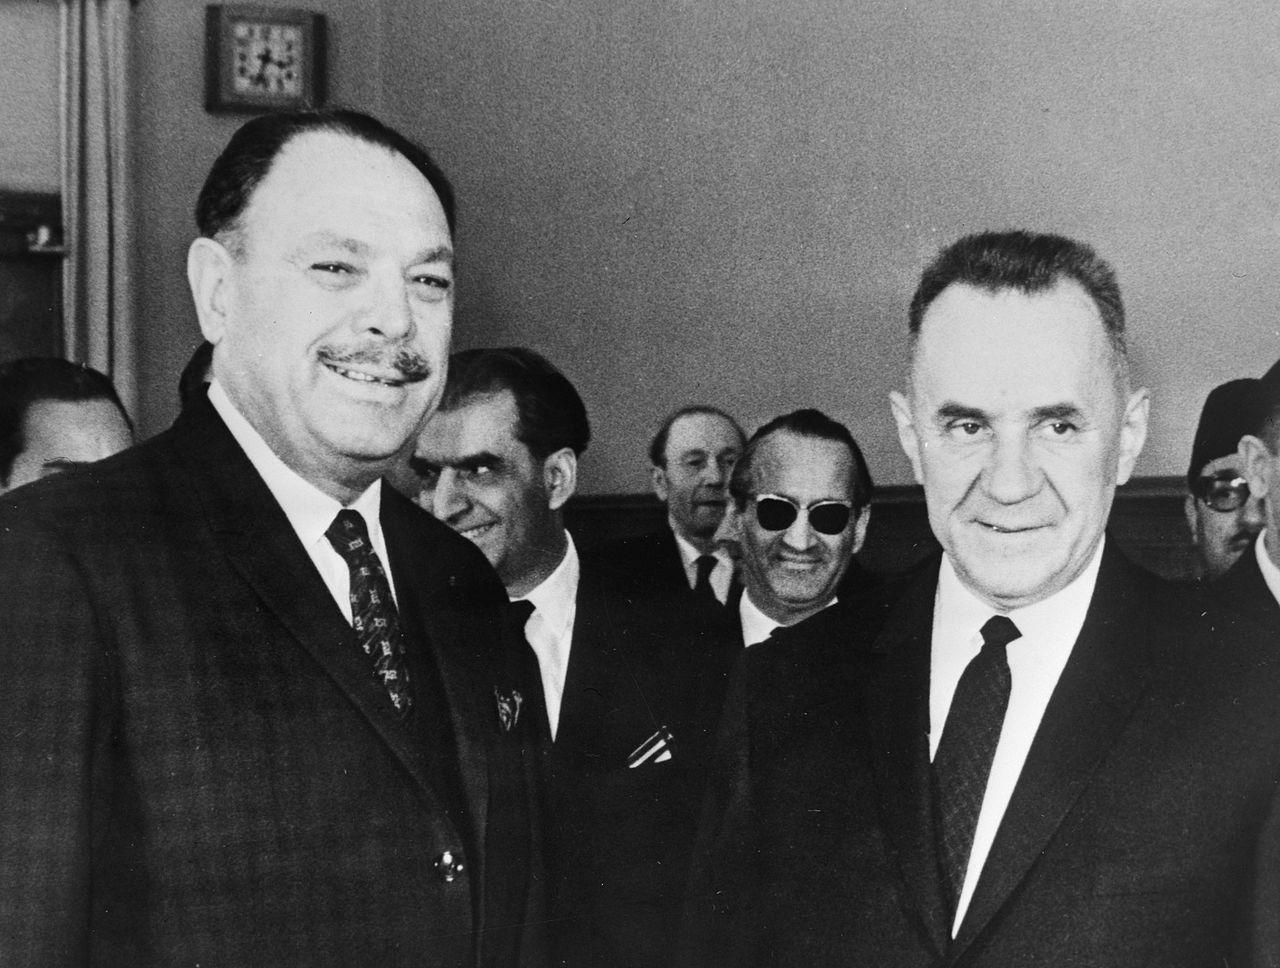 President Ayub Khan meeting Soviet Premier Alexei Kosygin in 1960s.